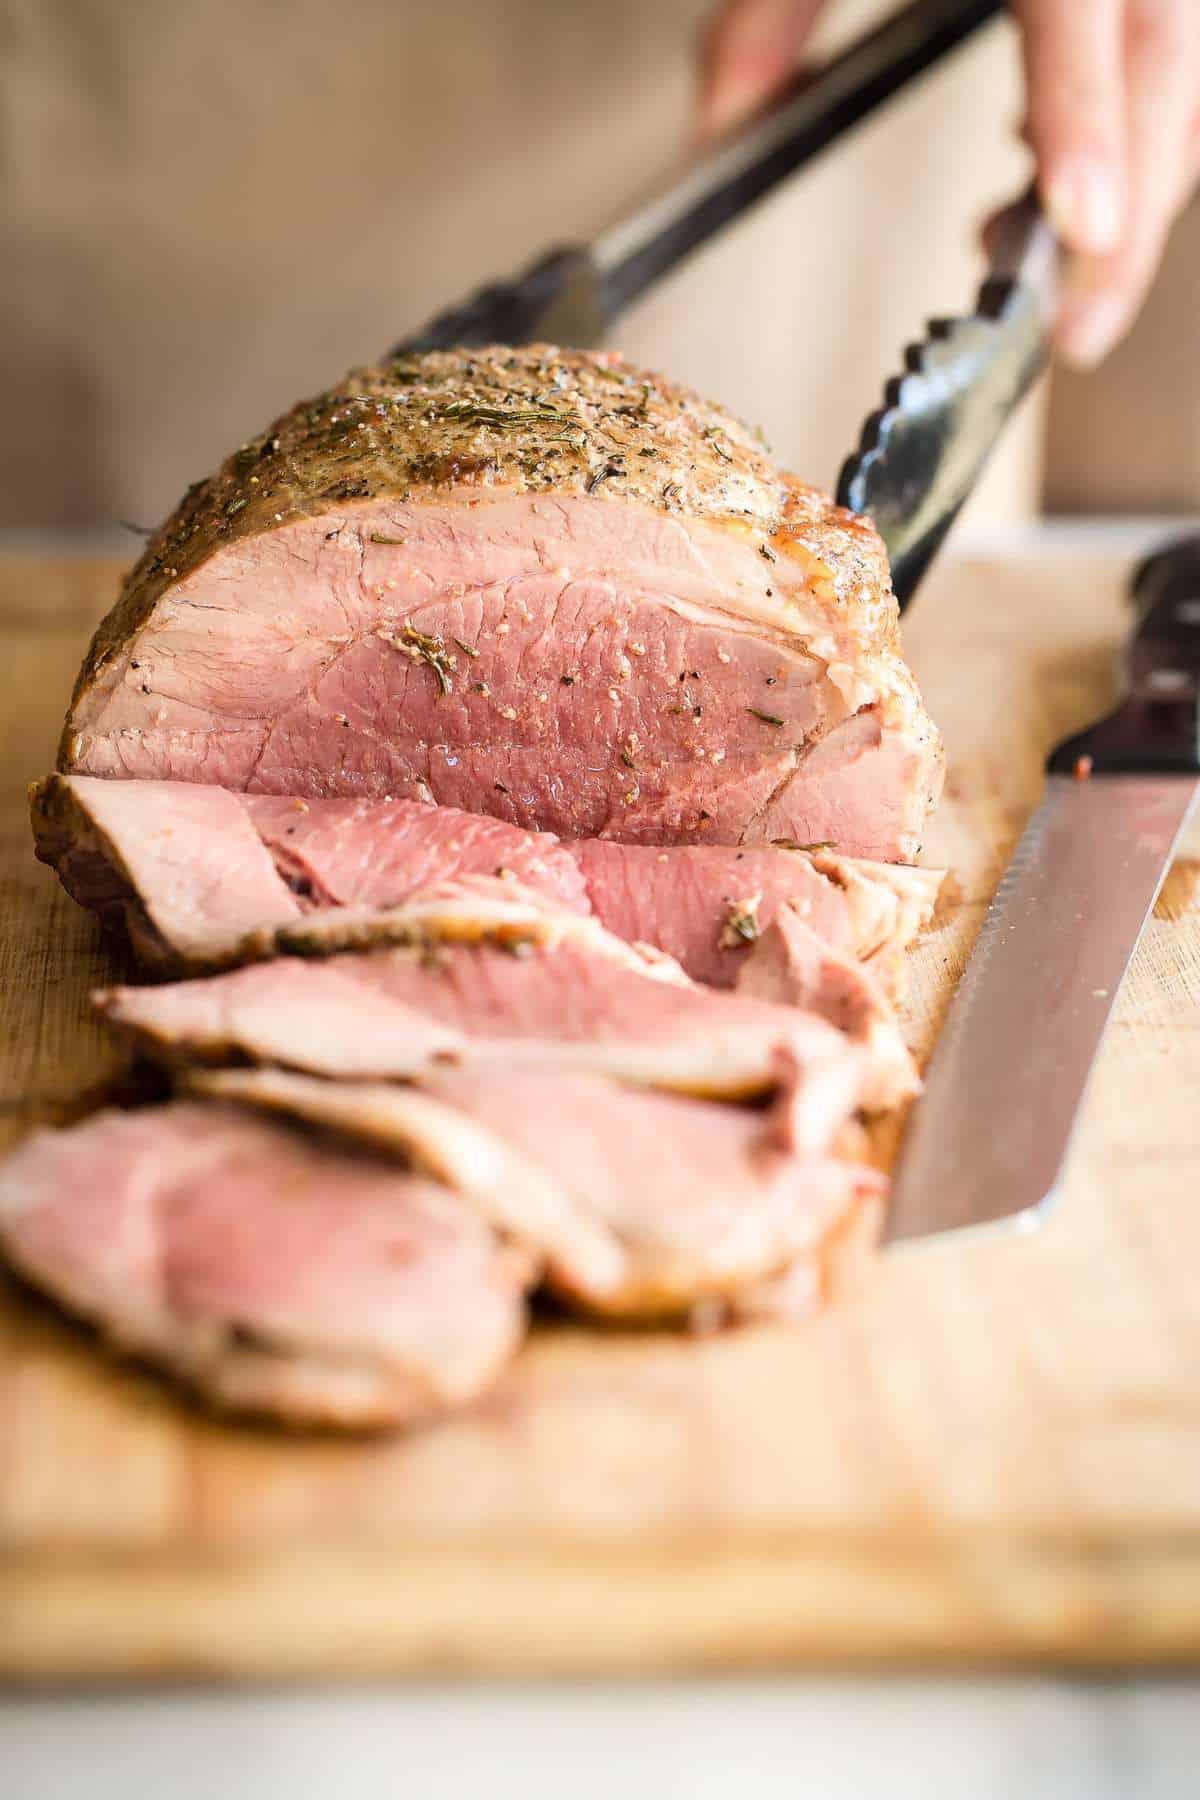 Juicy roast leg of lamb served with roasted root vegetables